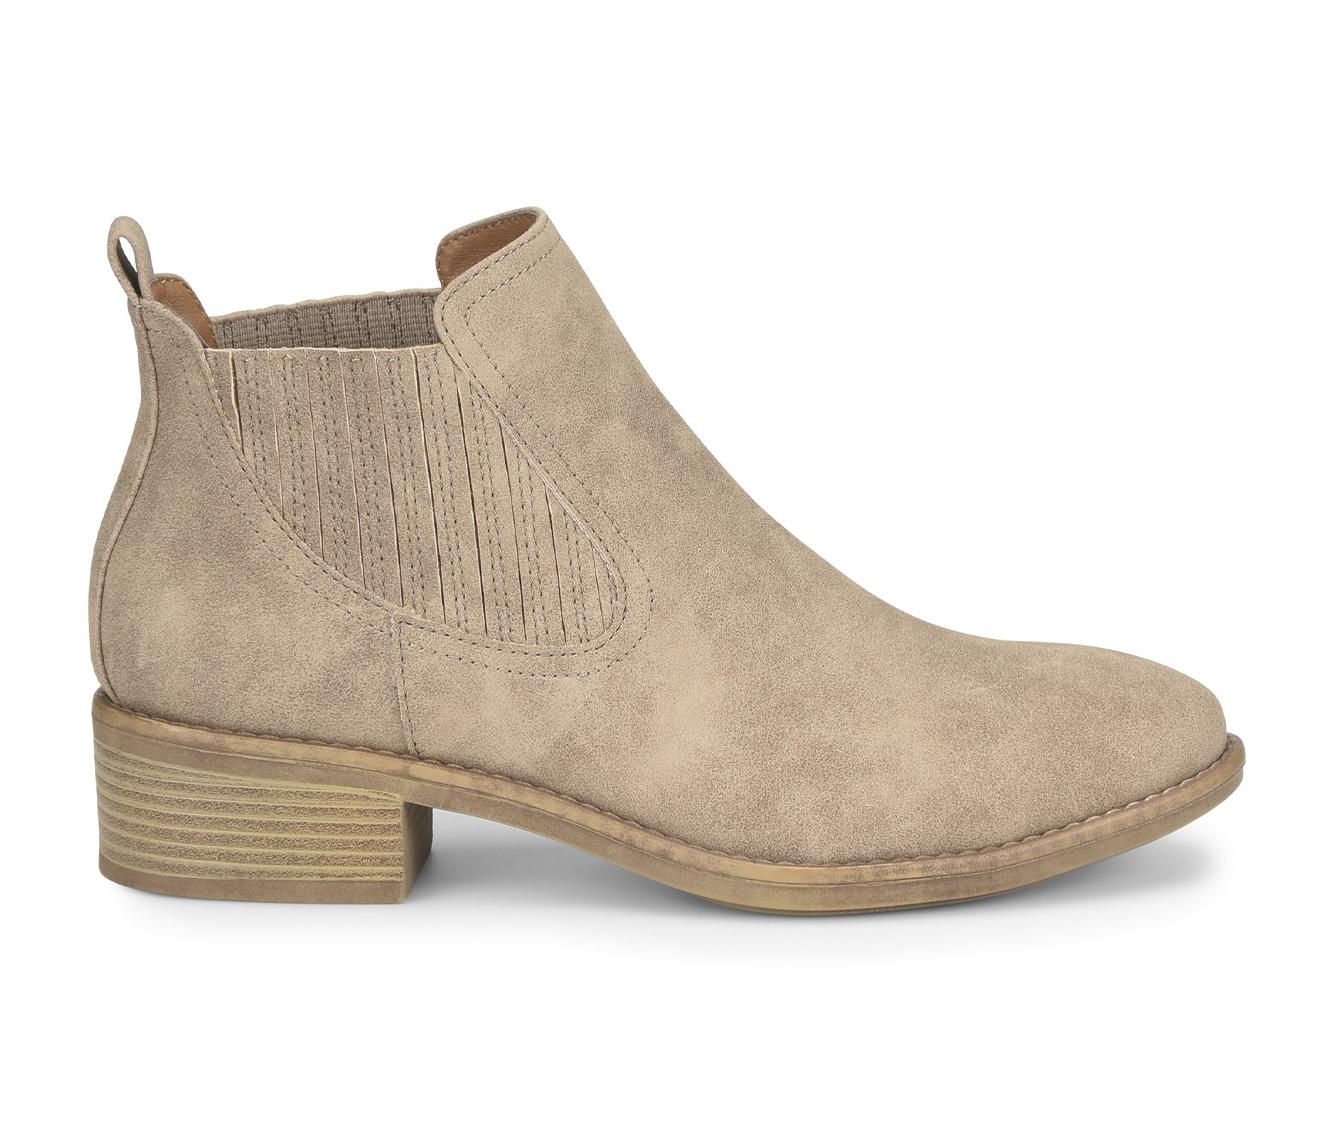 EuroSoft Colisa Women's Boot (Beige Faux Leather)